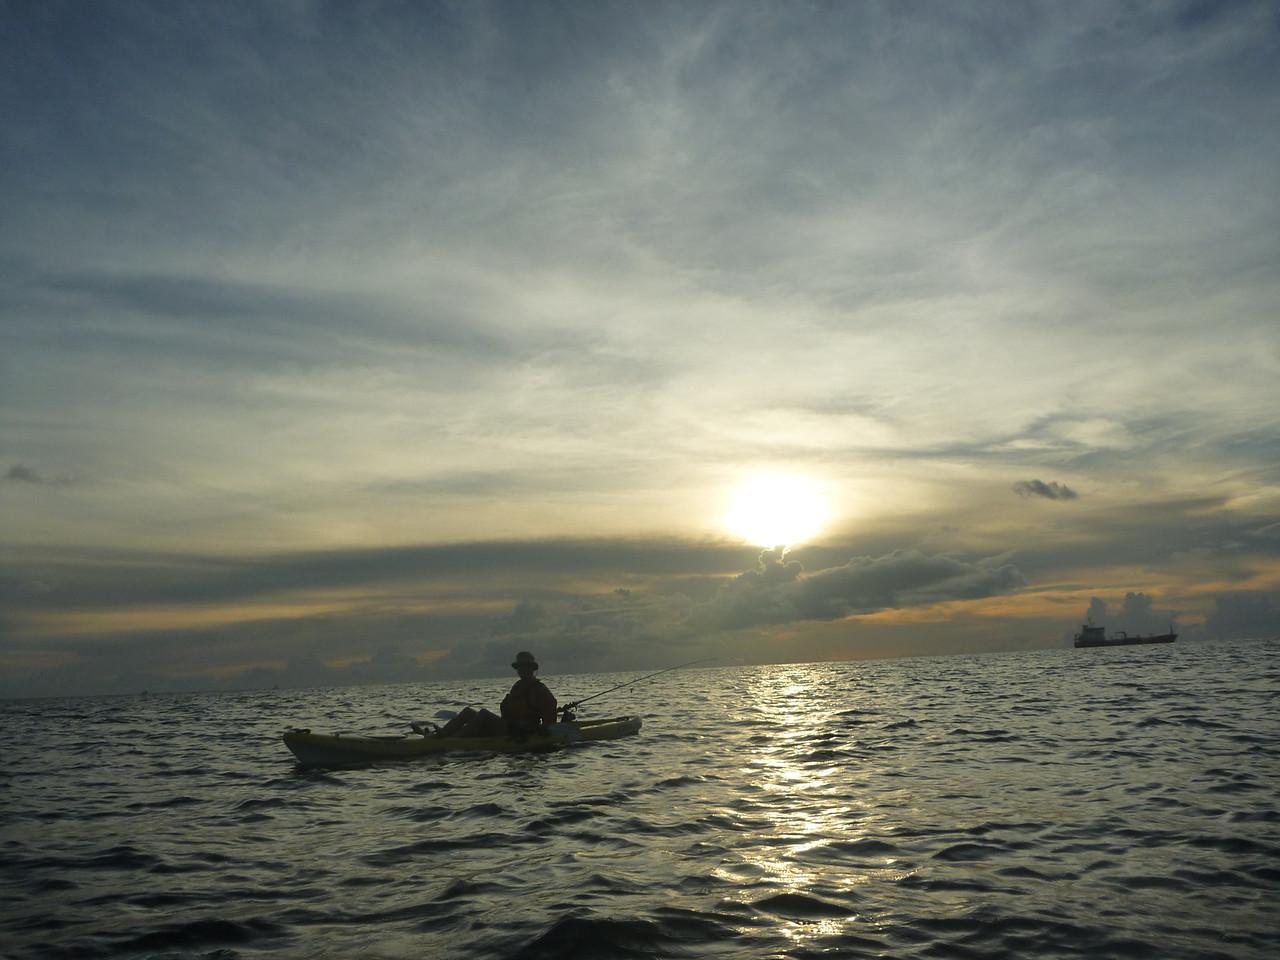 Kayaking the Caribbean Sea